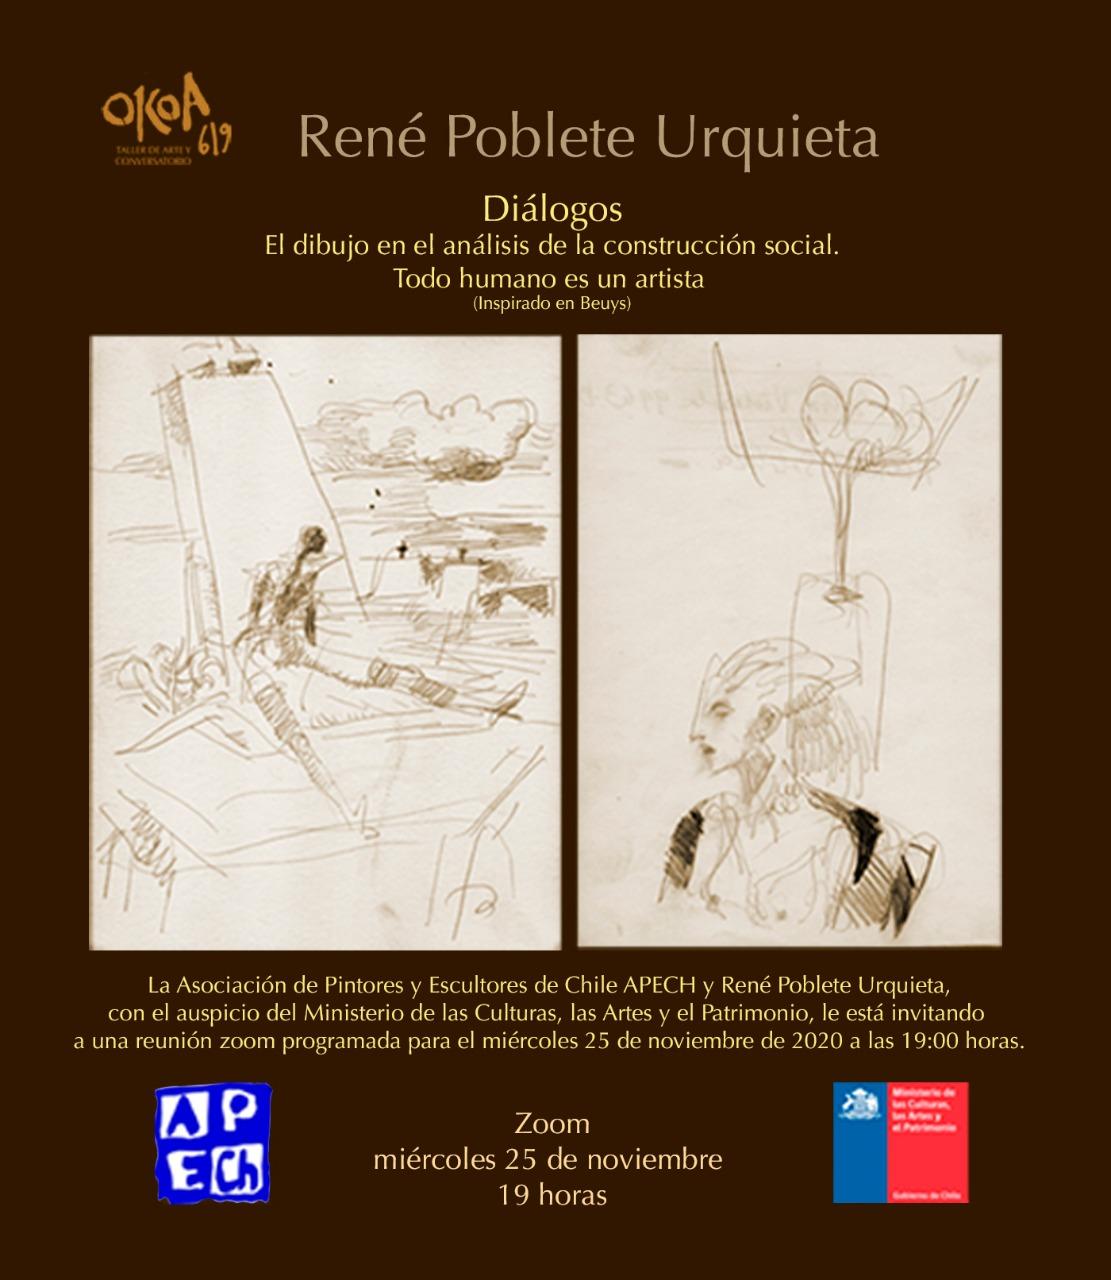 Charla René Poblete Urquieta